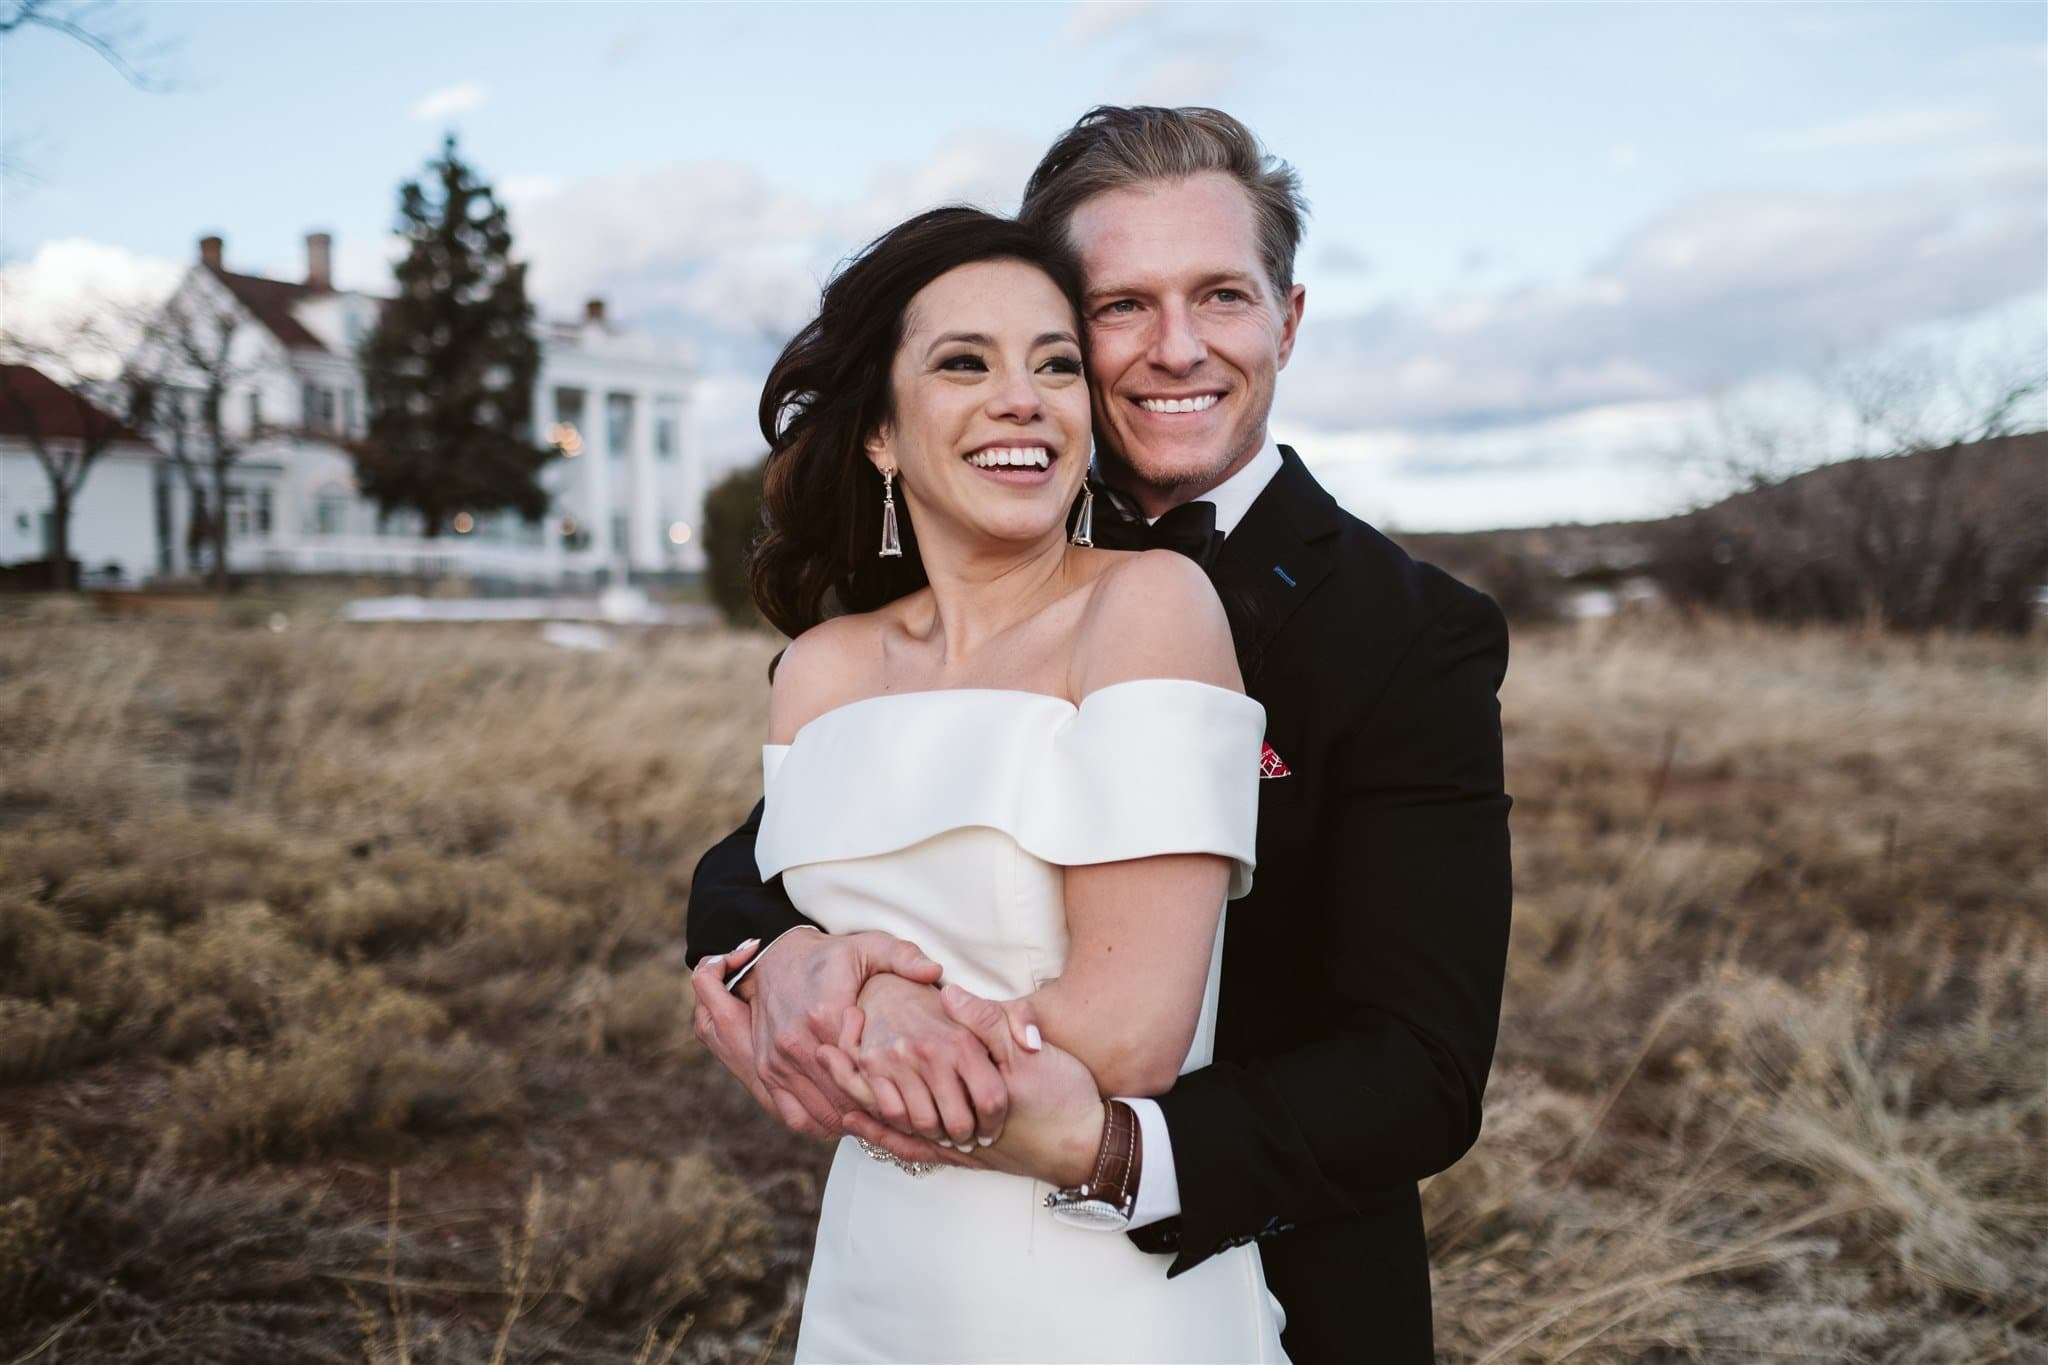 Bride and groom in front of a luxury wedding venue in Denver